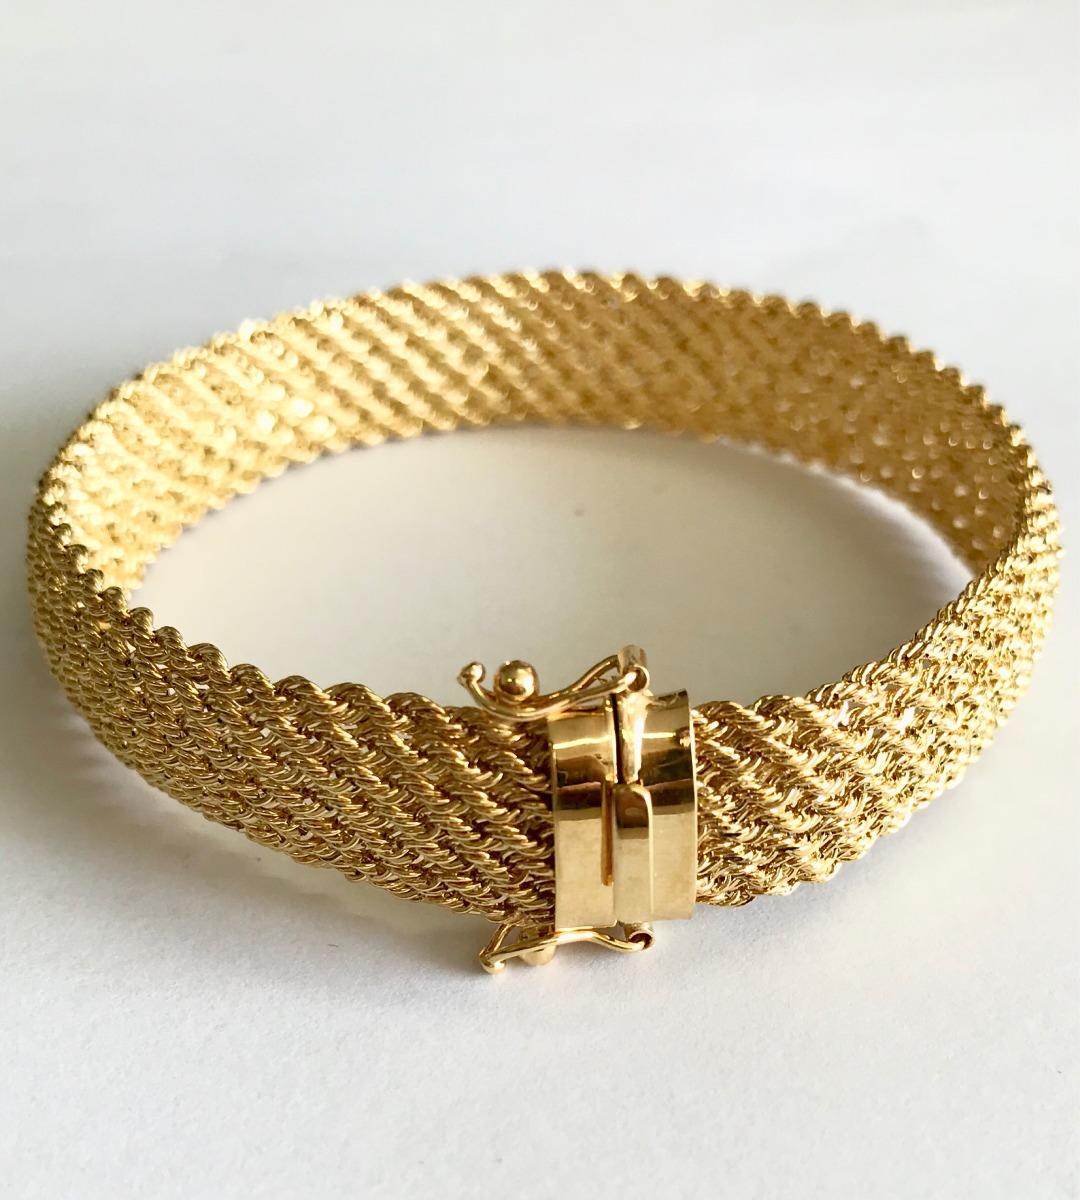 10ee33181b18b Pulseira Bracelete Feminina Corda 13 Mm Ouro 18k 750 - R  3.200,00 ...